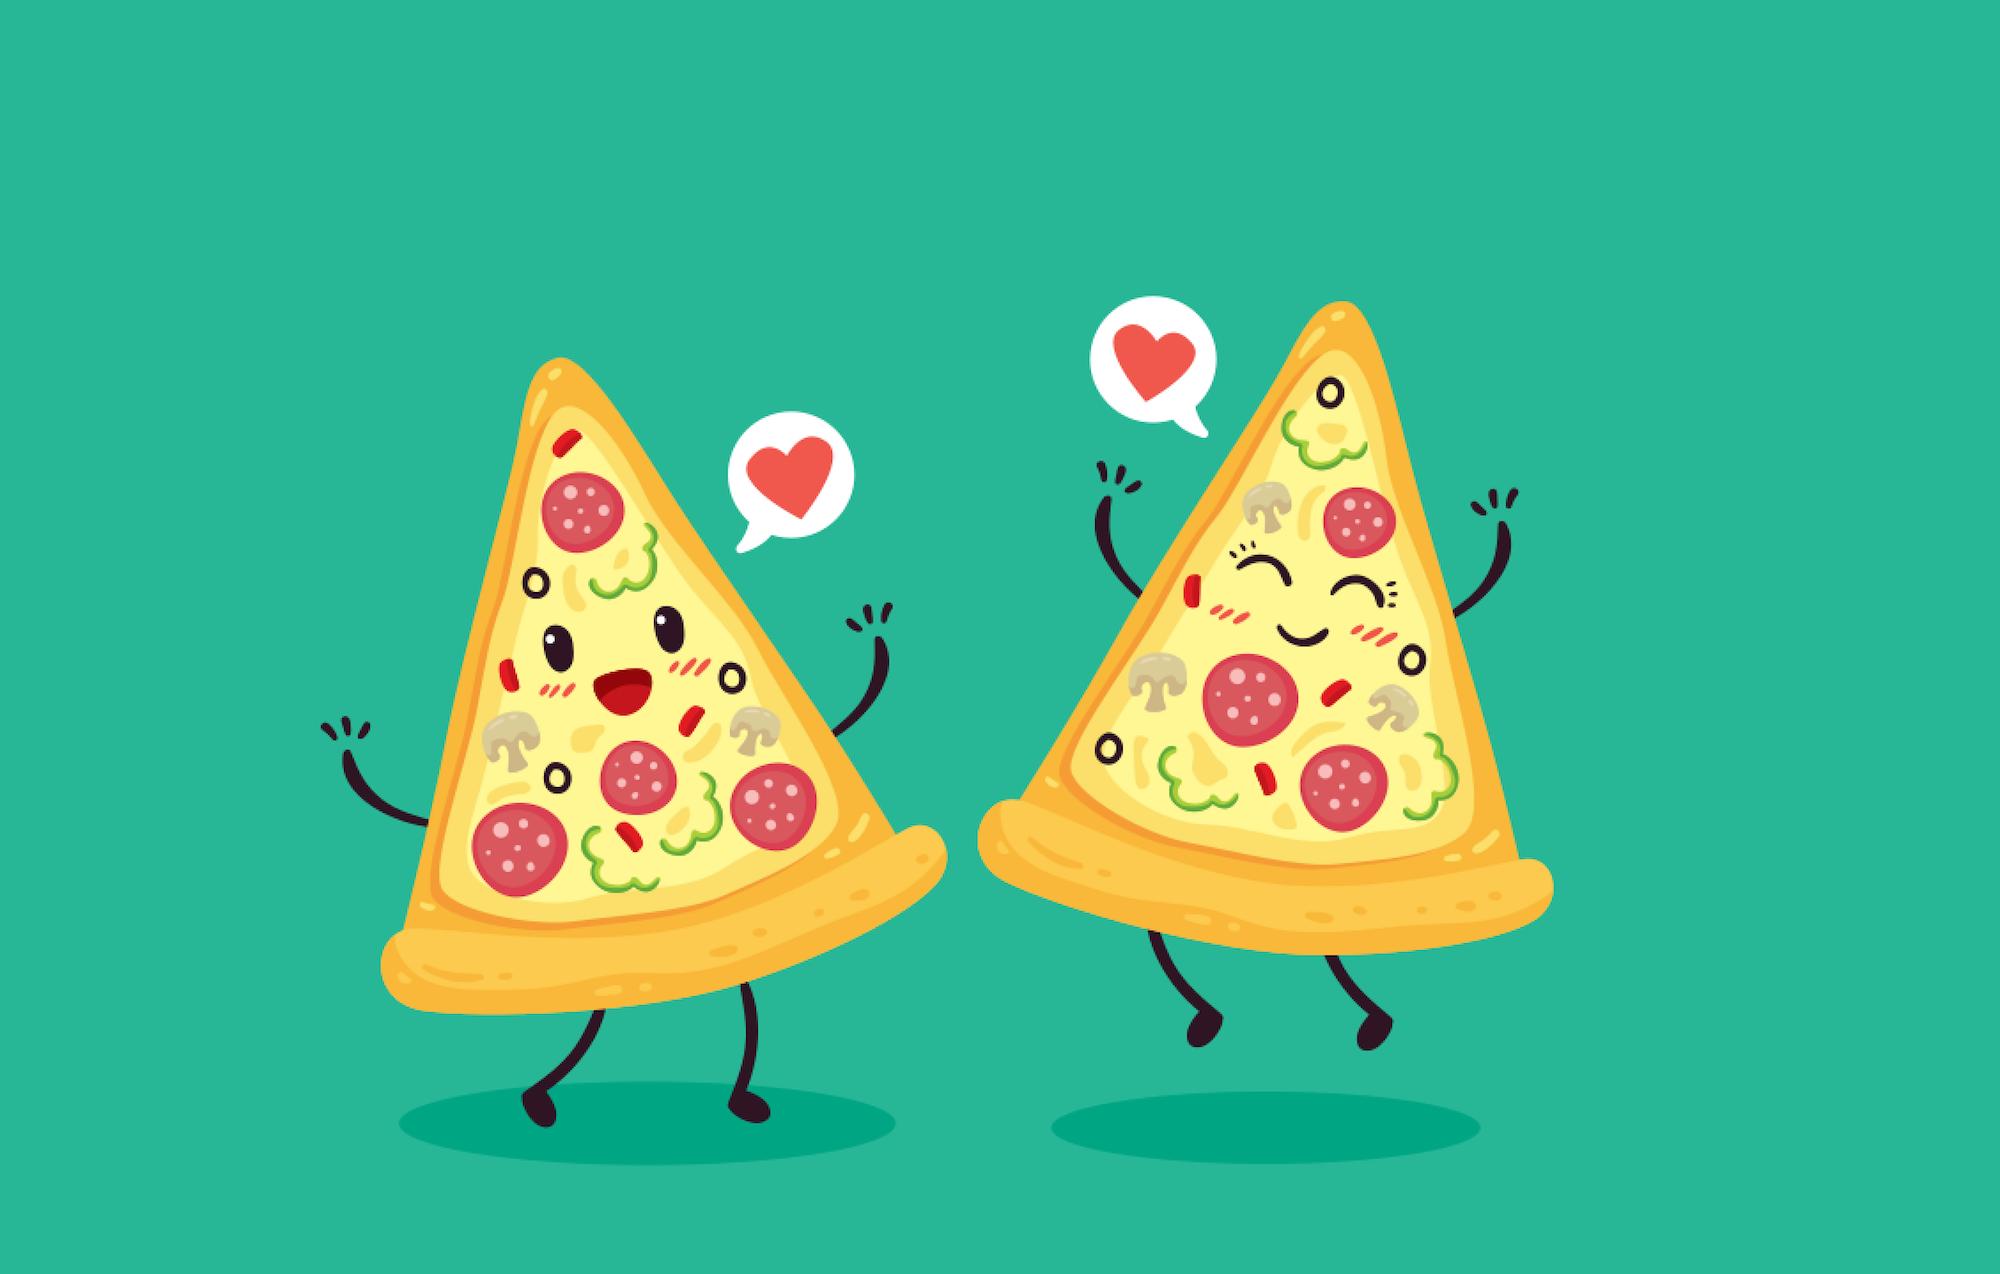 Domino's pizza DMP slices